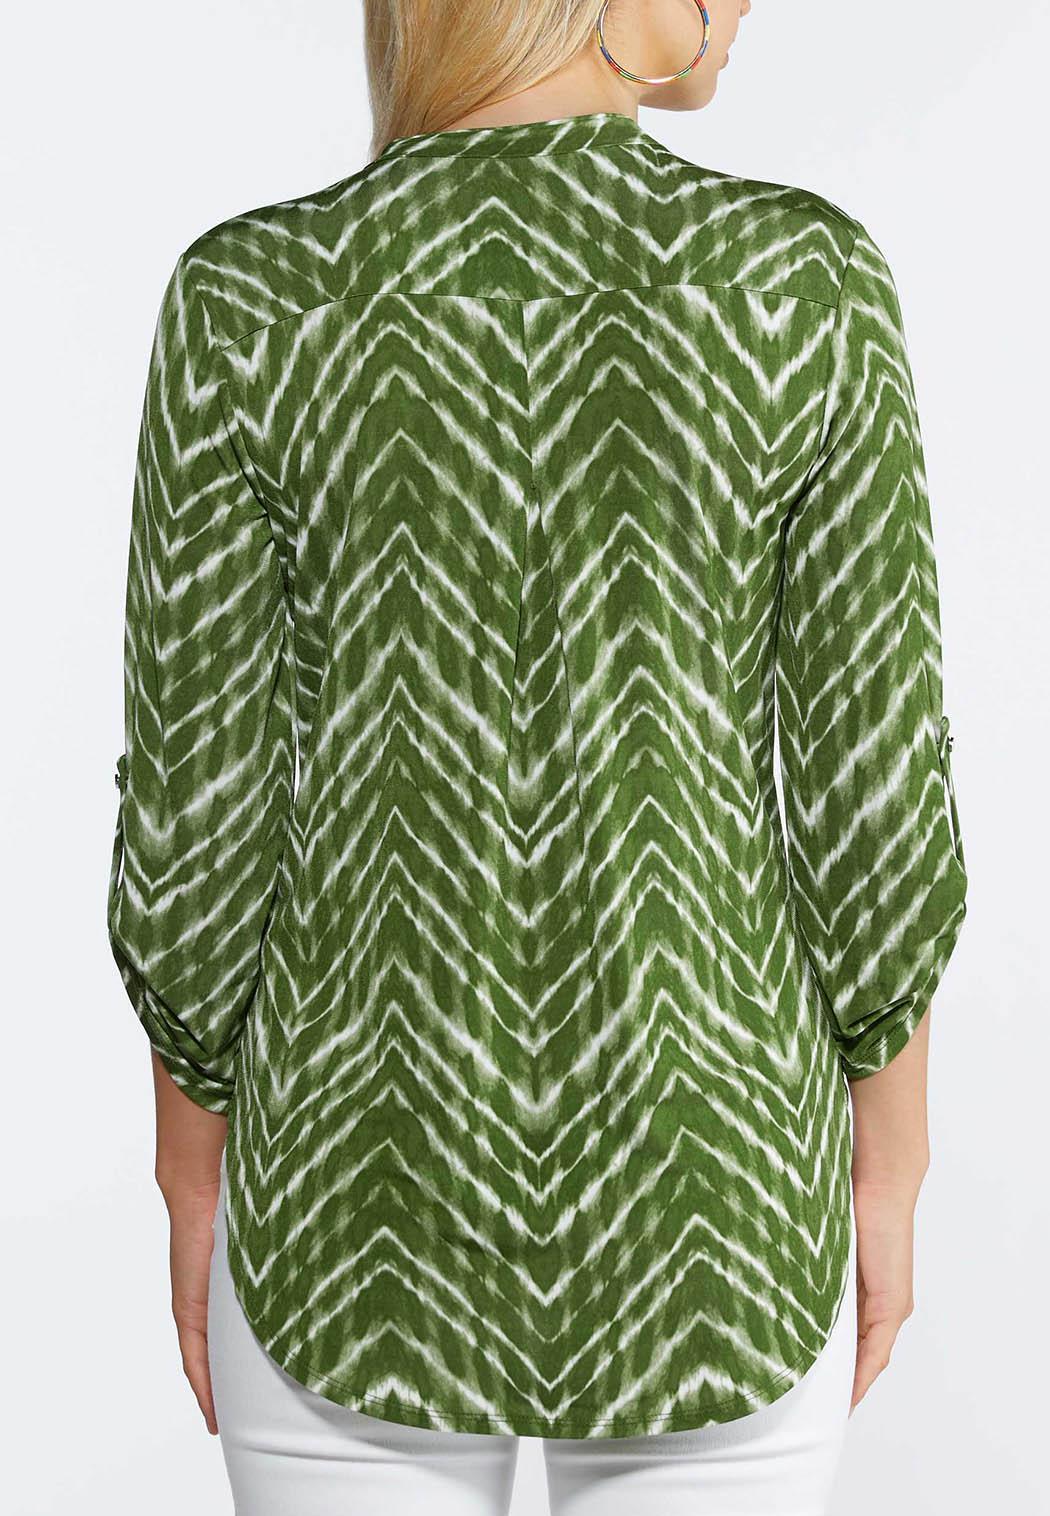 Green Tie Dye Top (Item #44330108)